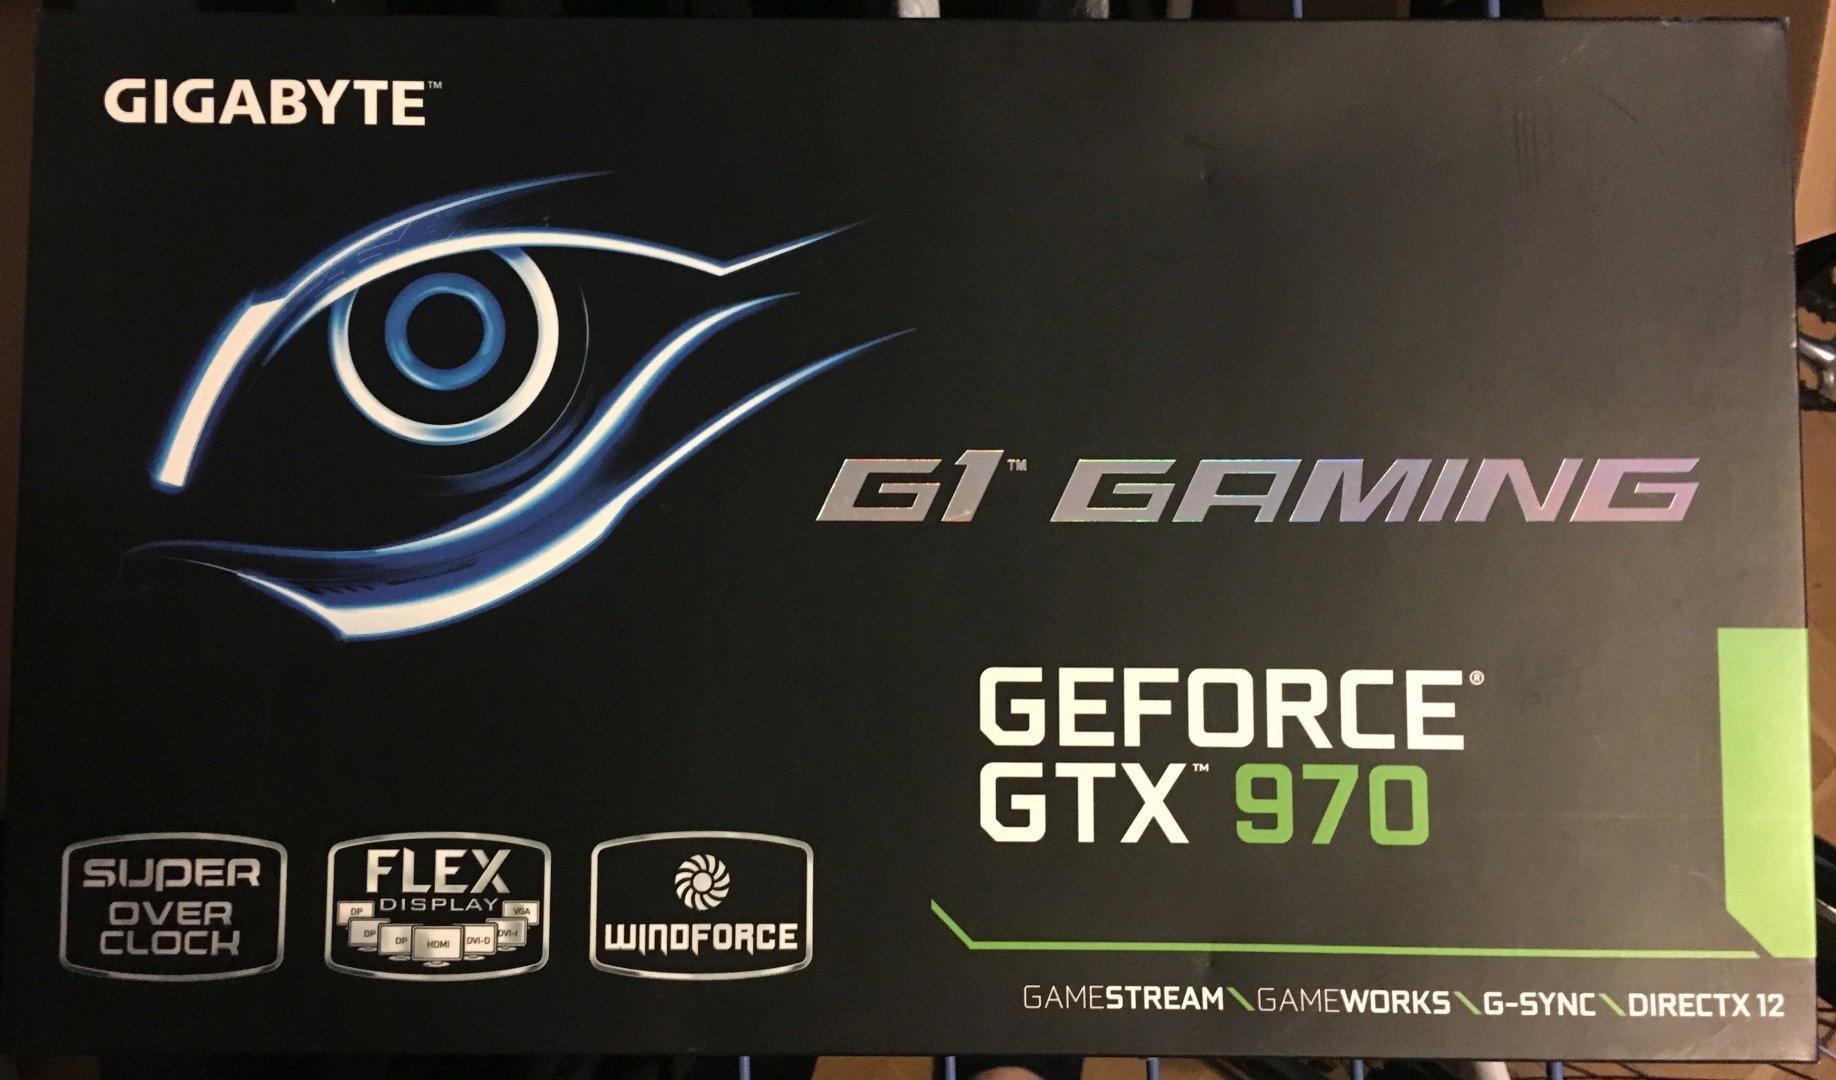 Gigabyte GeForce GTX 970 G1 Gaming